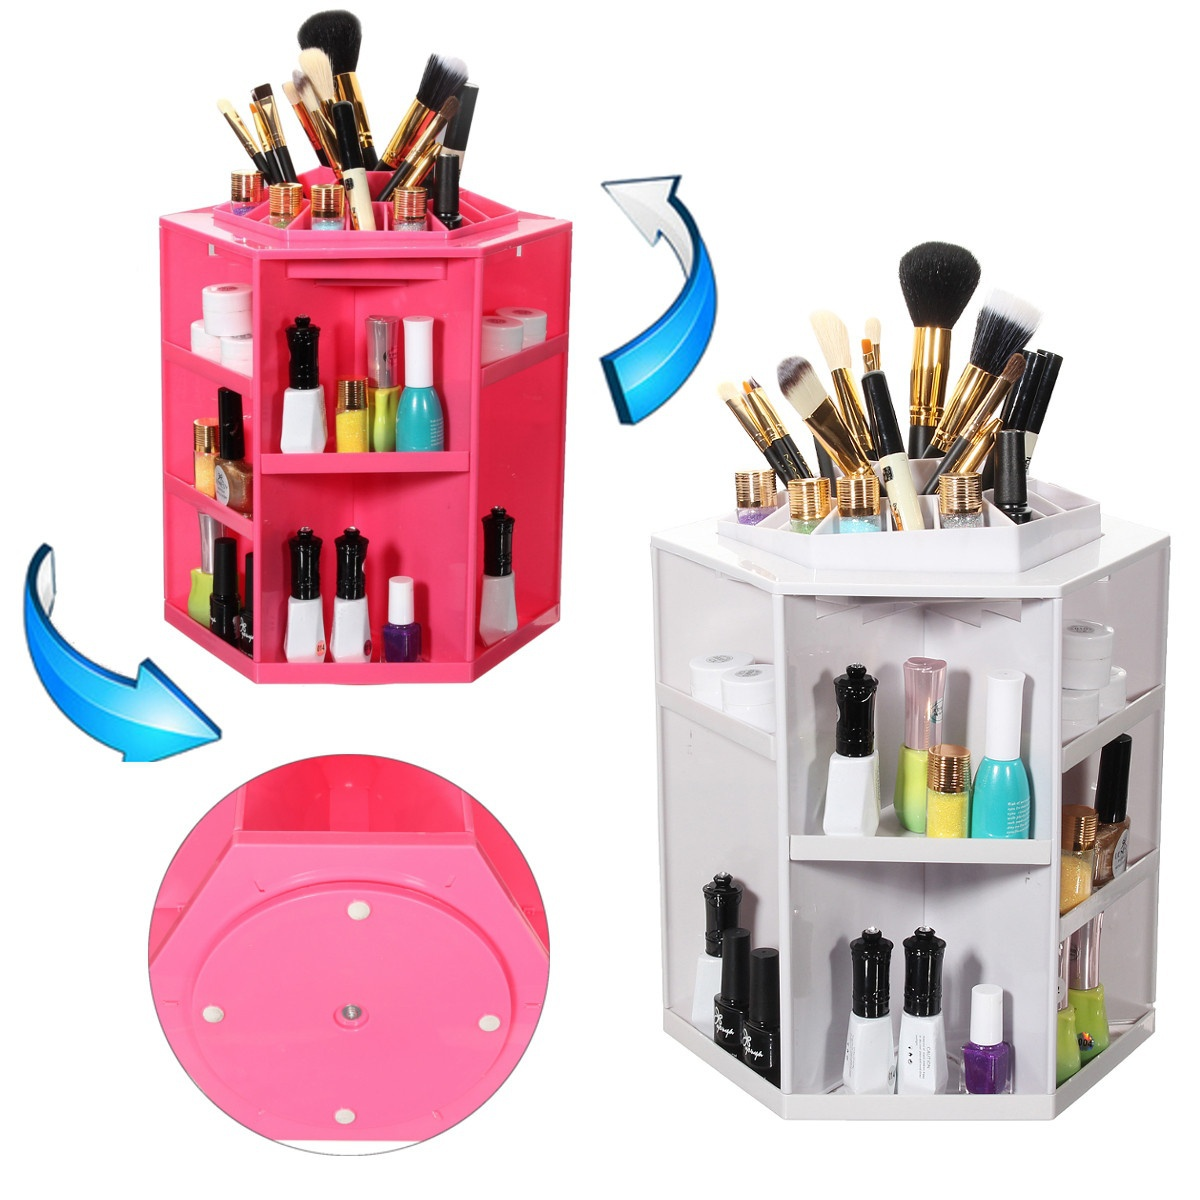 360 Degree Rotation Cosmetic Storage Box Polygon Folding Desktop Makeup Tool Storage Box Cosmetic Makeup Organizer